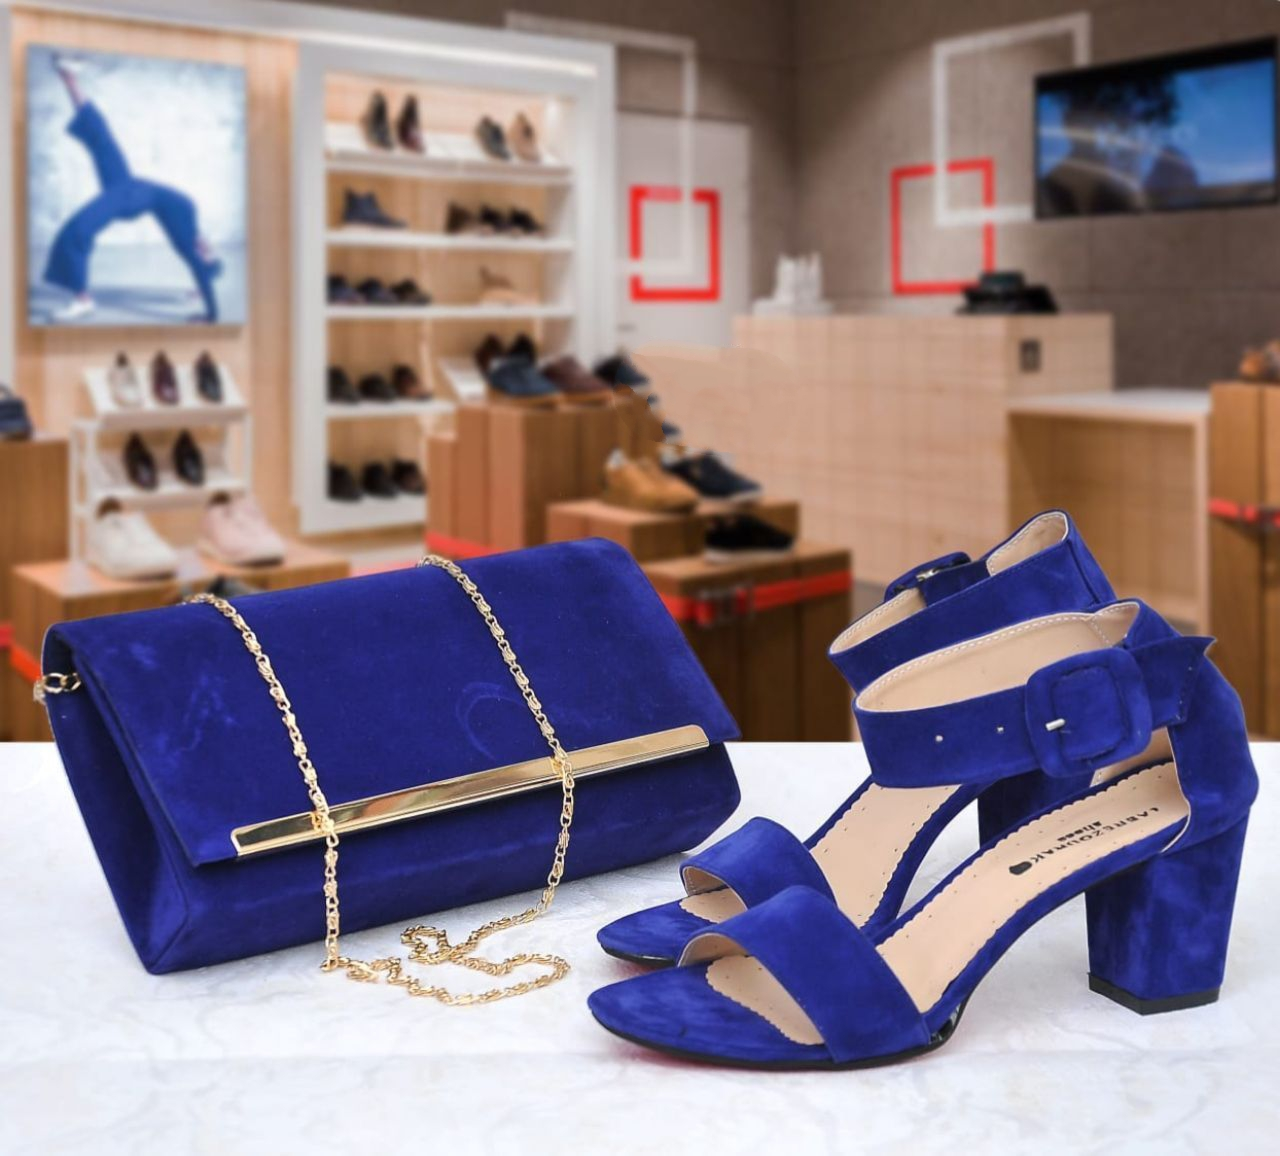 Set sac/sandale élégance, Bleu, 37